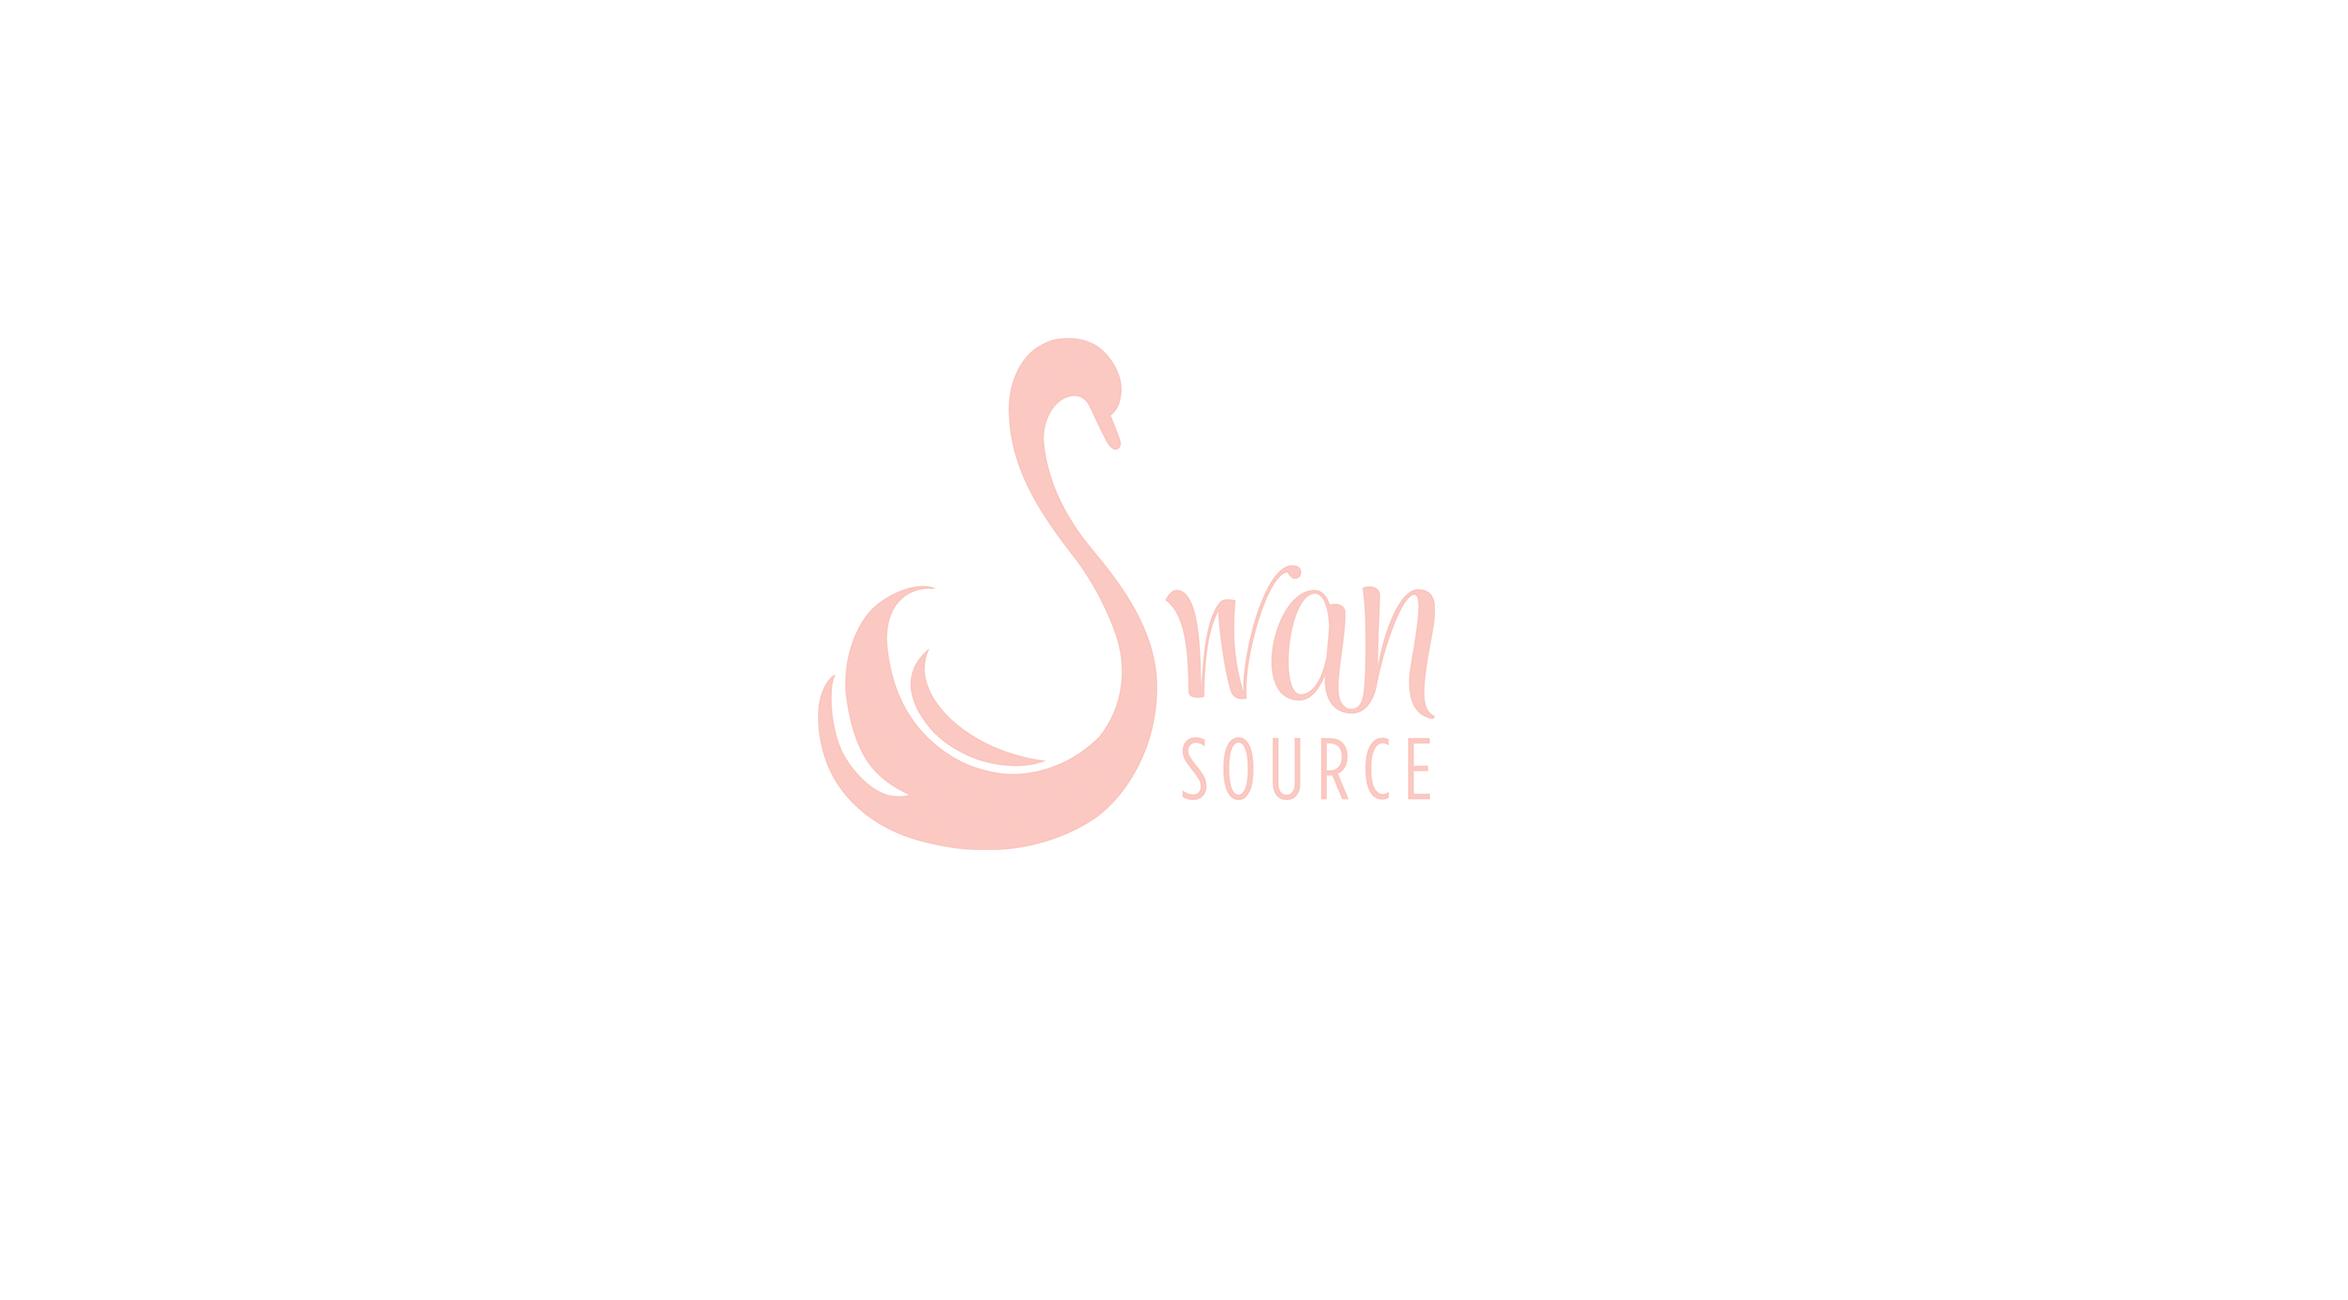 Kymera - Swan Source